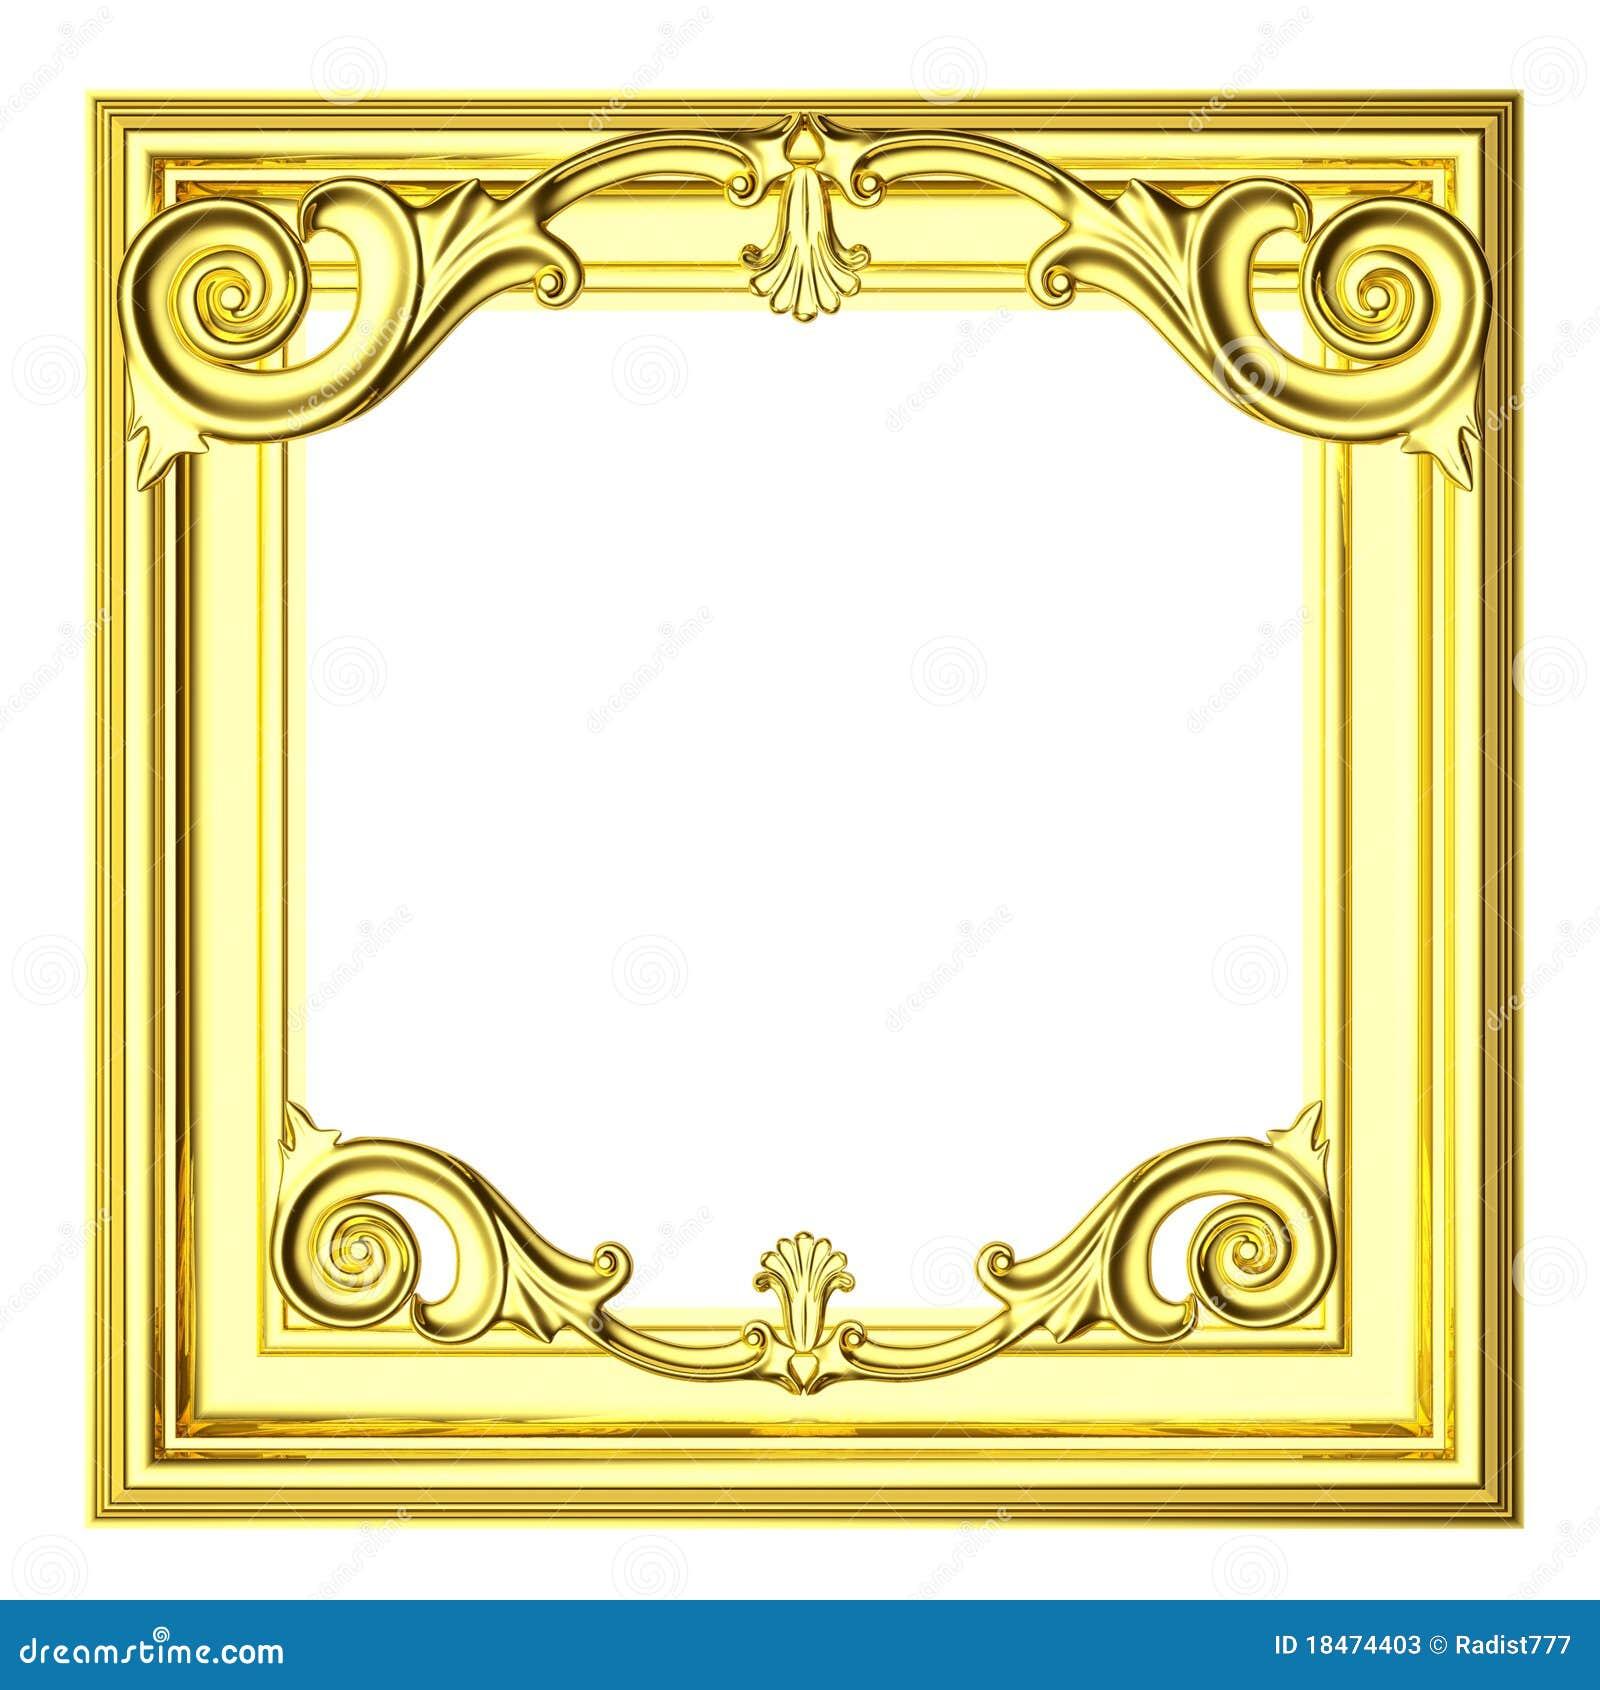 Asombroso Marcos De Oro A Granel Fotos - Ideas Personalizadas de ...